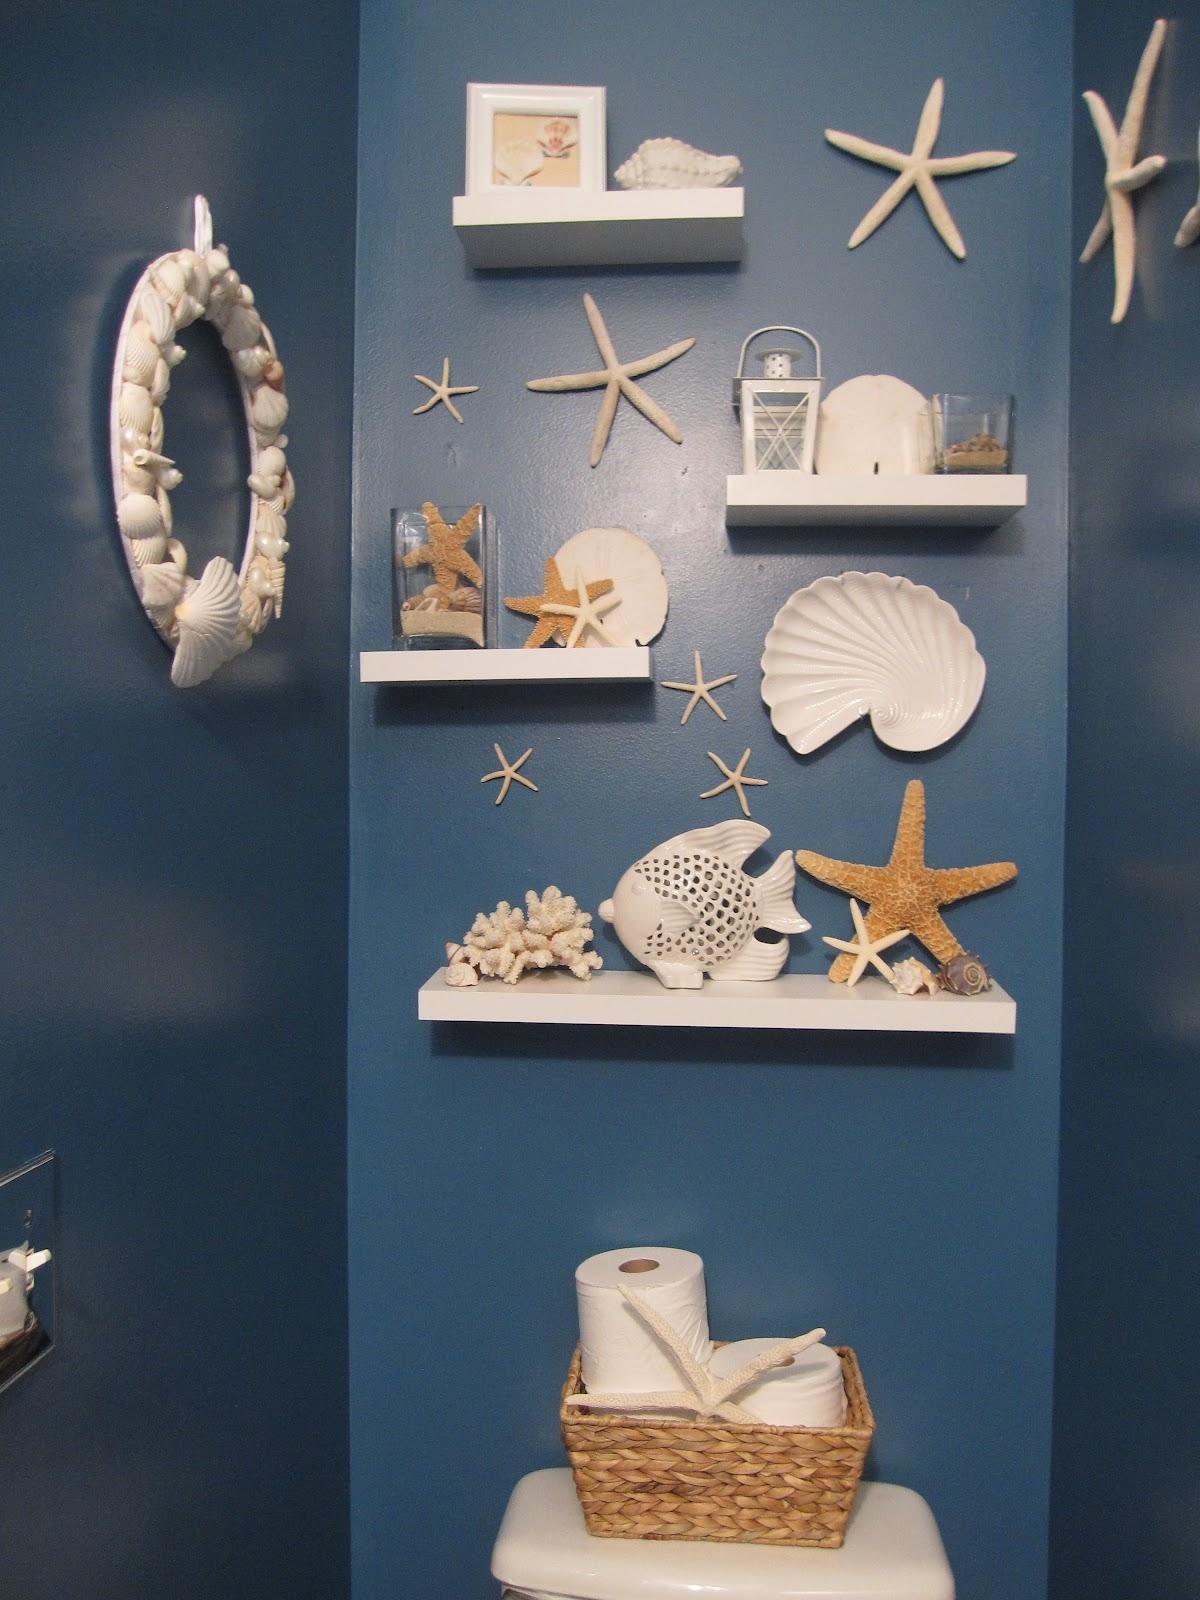 Beach Decor Wall Mirrors Beach Decor Wall Mirrors 25 decoration ideas to getting your dream nautical bathroom 1200 X 1600